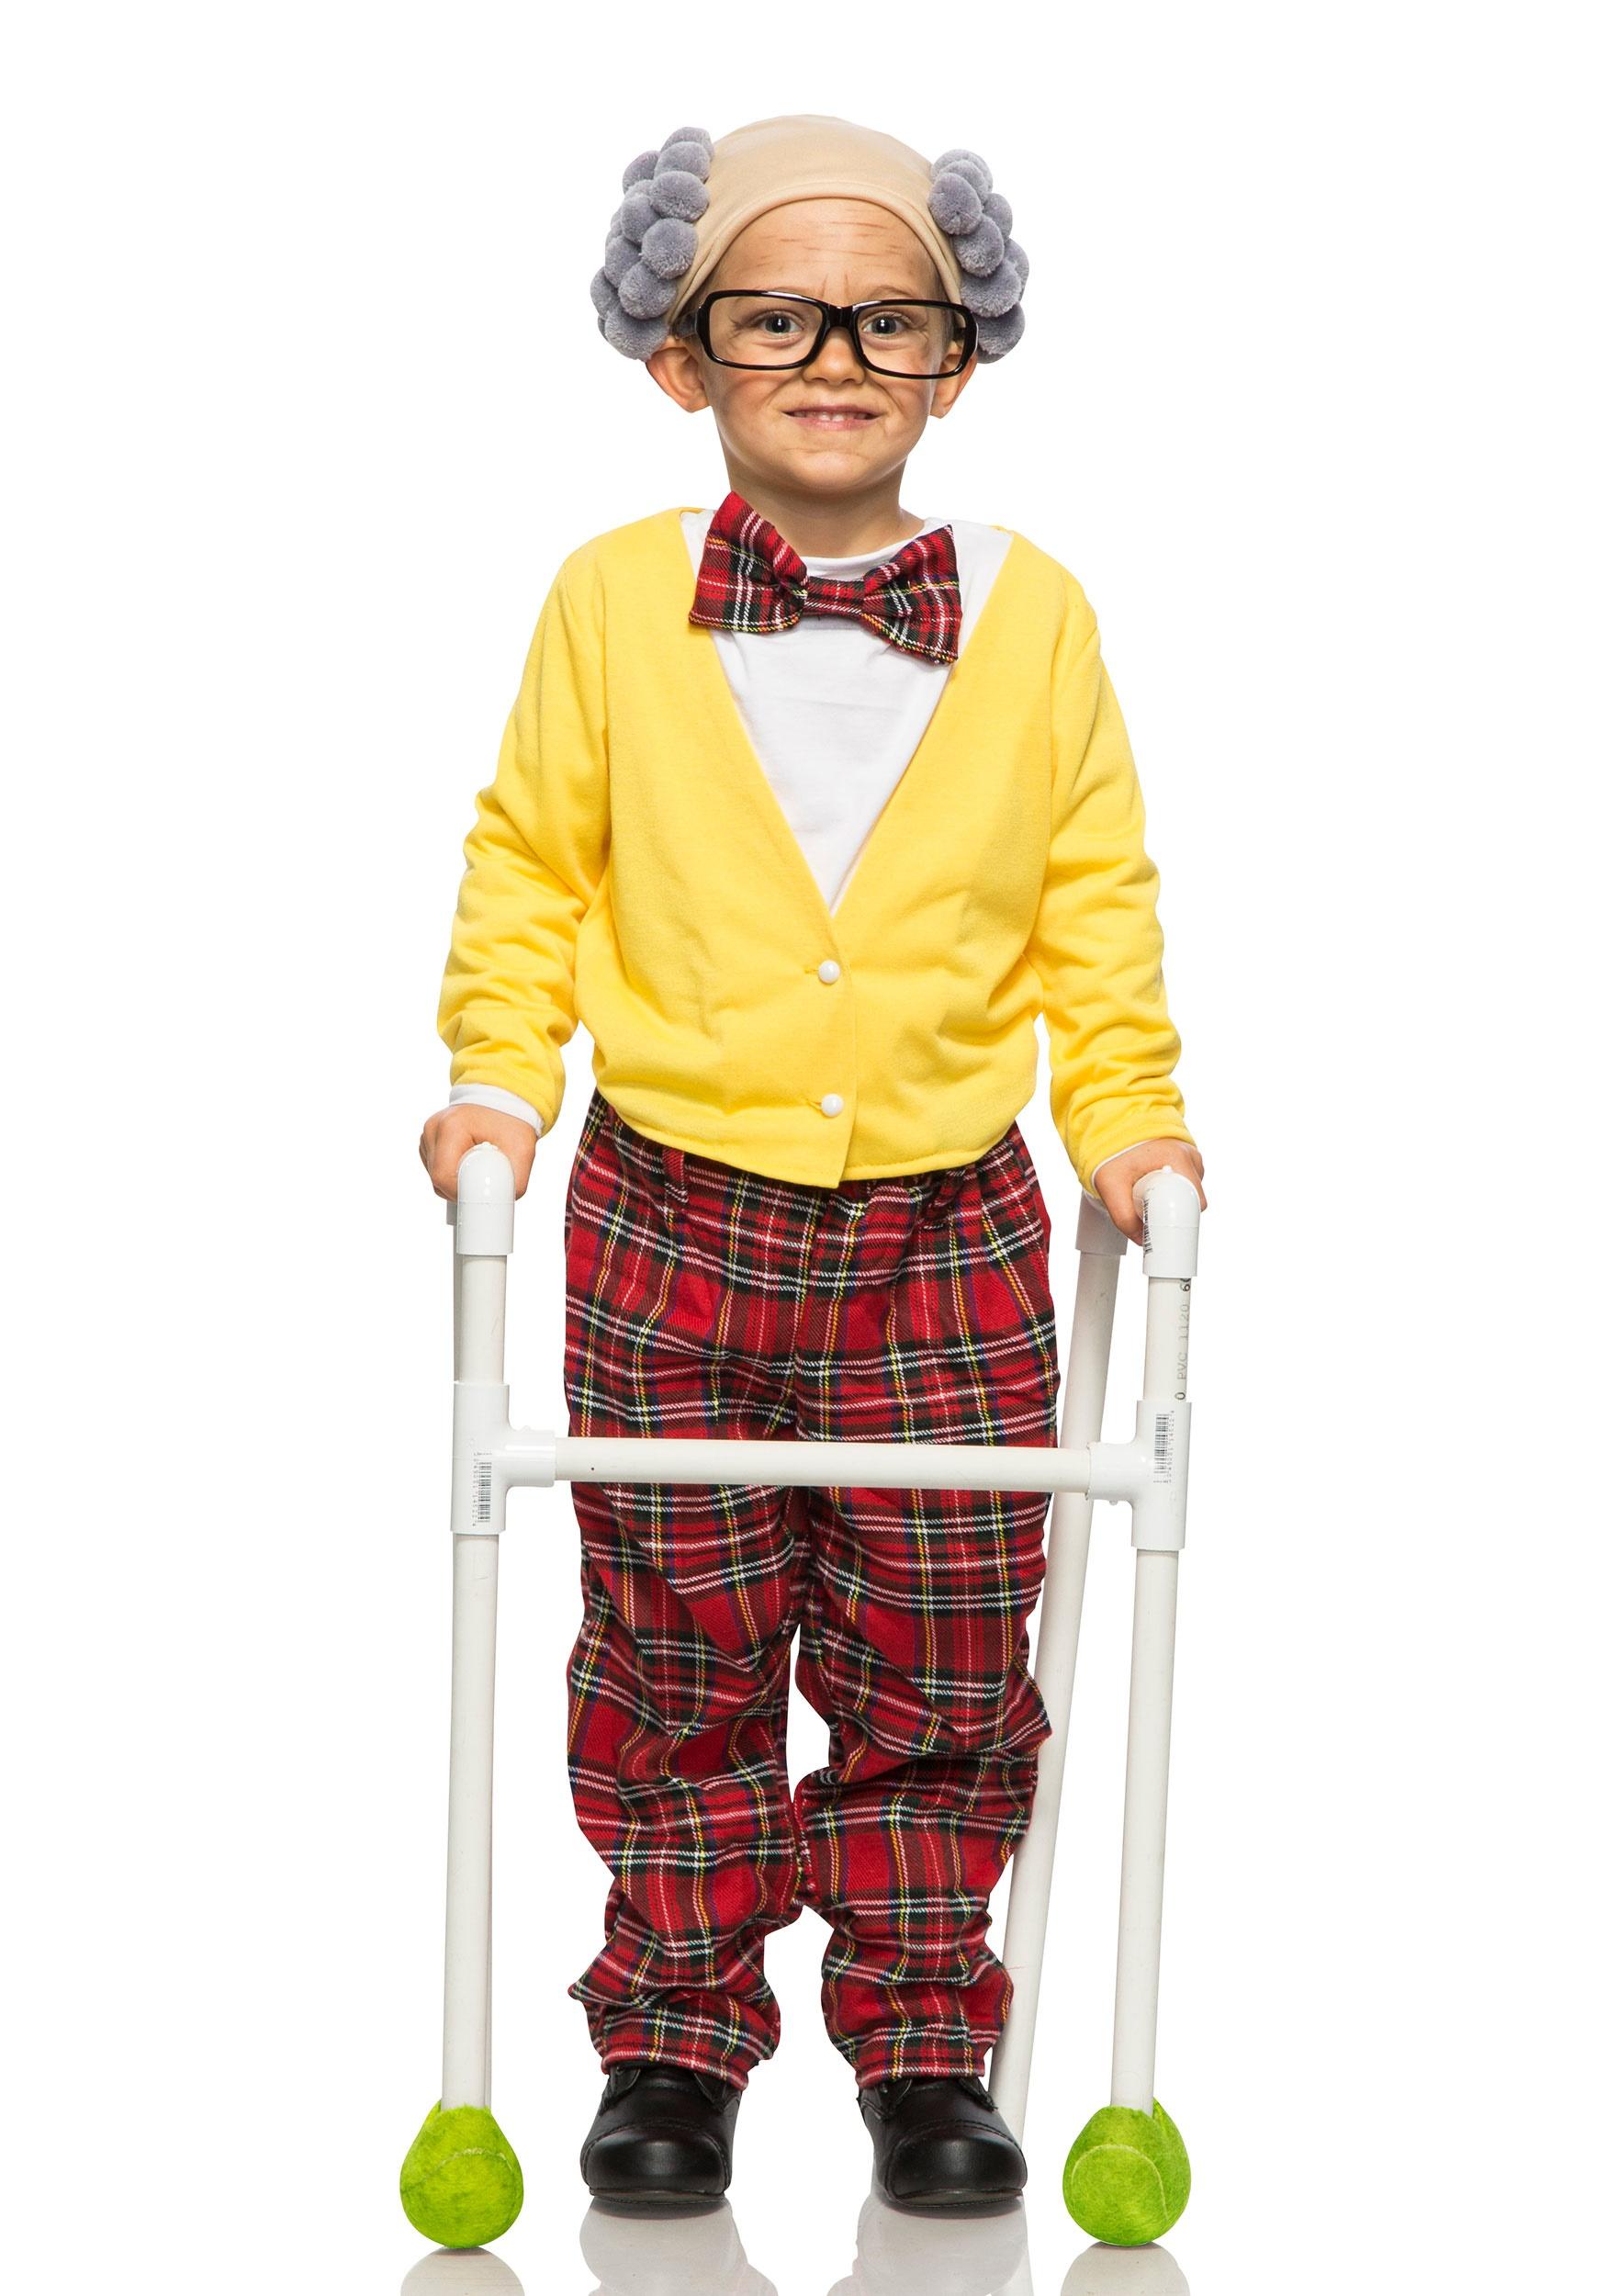 83f24f11f6 Old Man Costumes - Funny